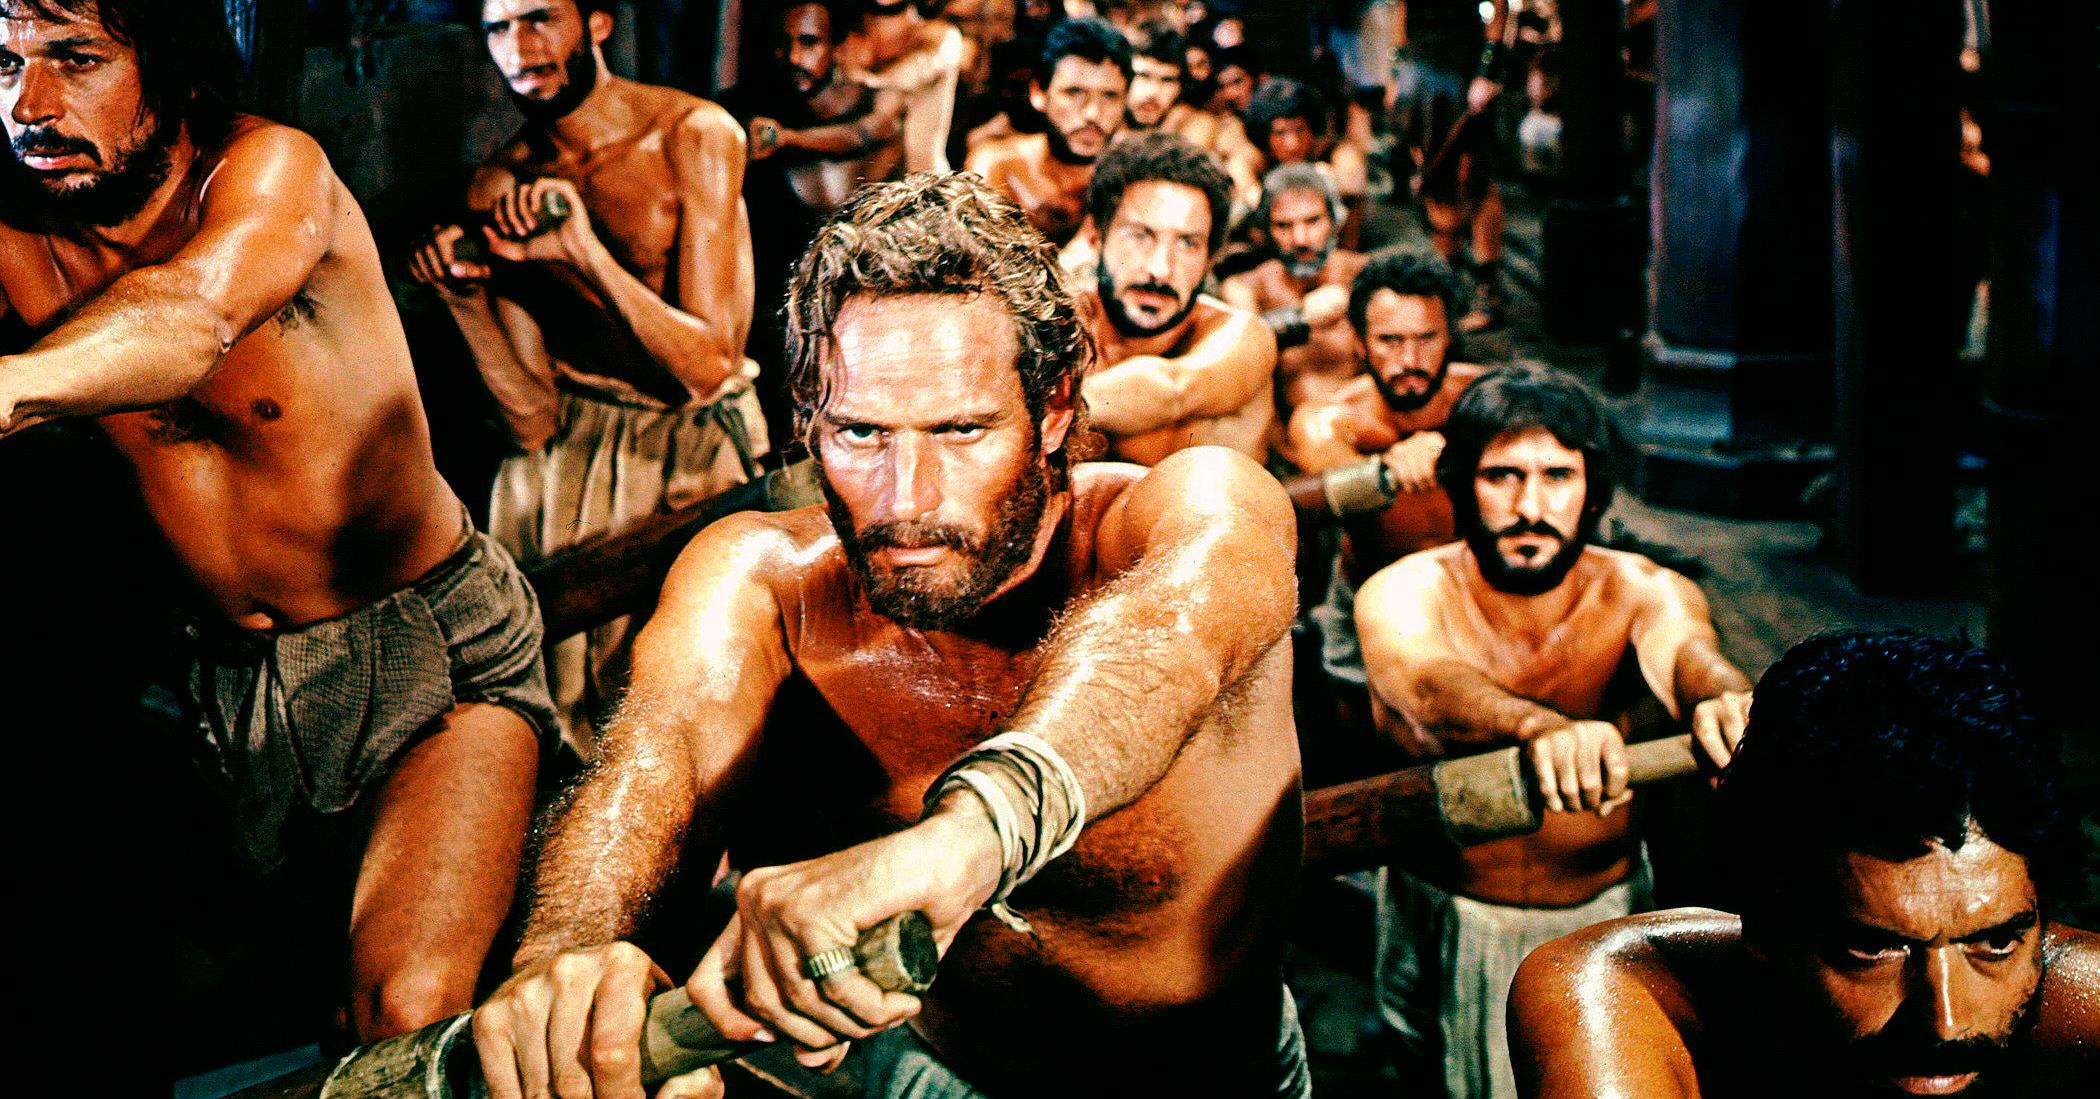 10 cosas que quizás no sabías de 'Ben-Hur' - Película de 1959